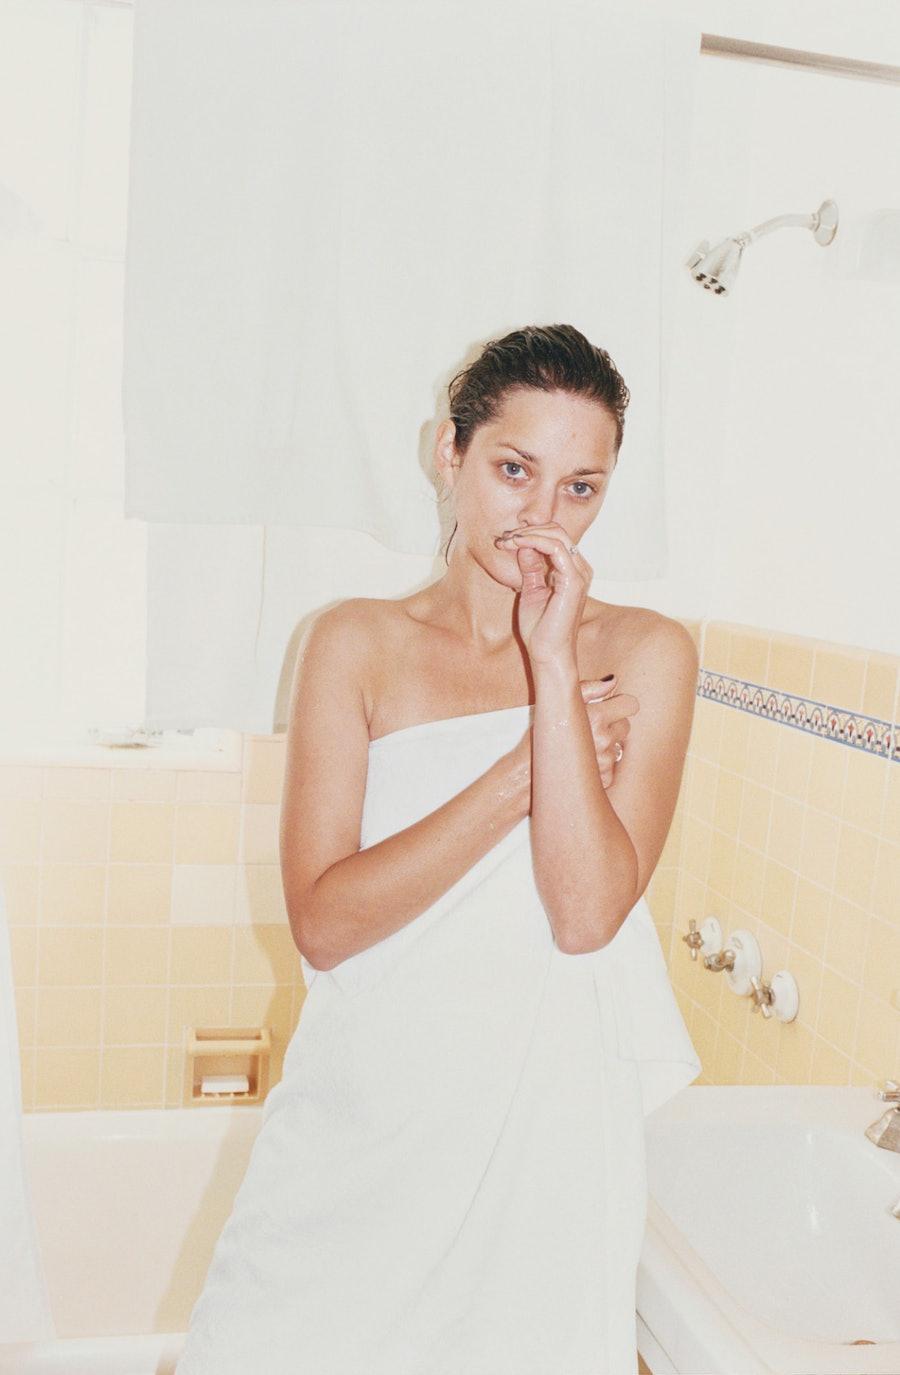 Bath photograph